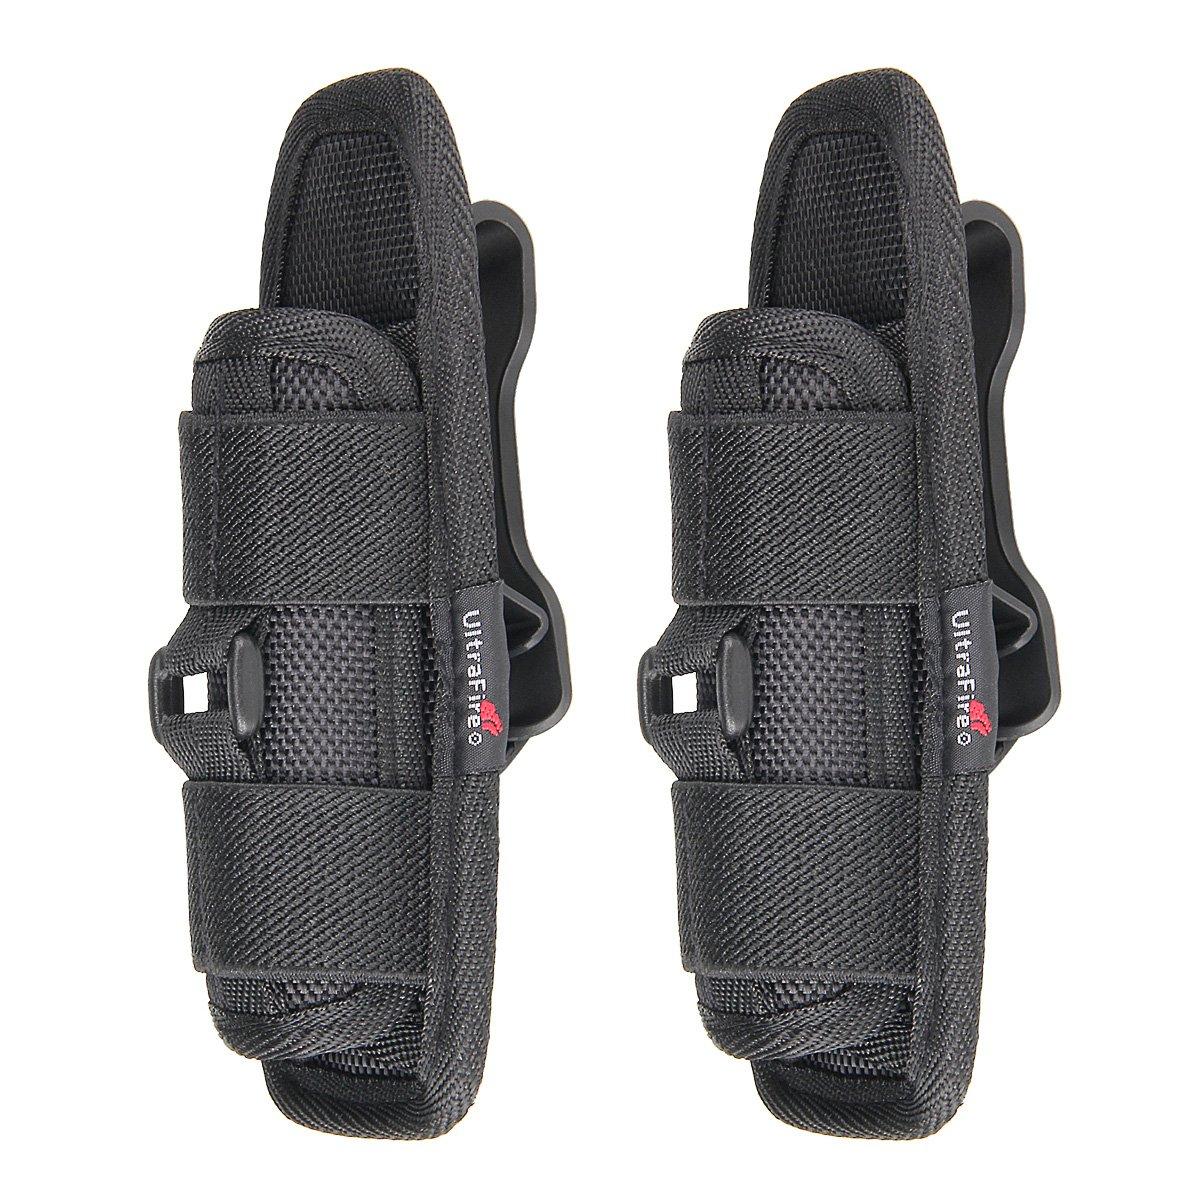 ULTRAFIRE Flashlight Holster, Baton Holder,Nylon Duty Flashlight Holder Belt Carry Case for Tactical Flashlights, 2 PCS